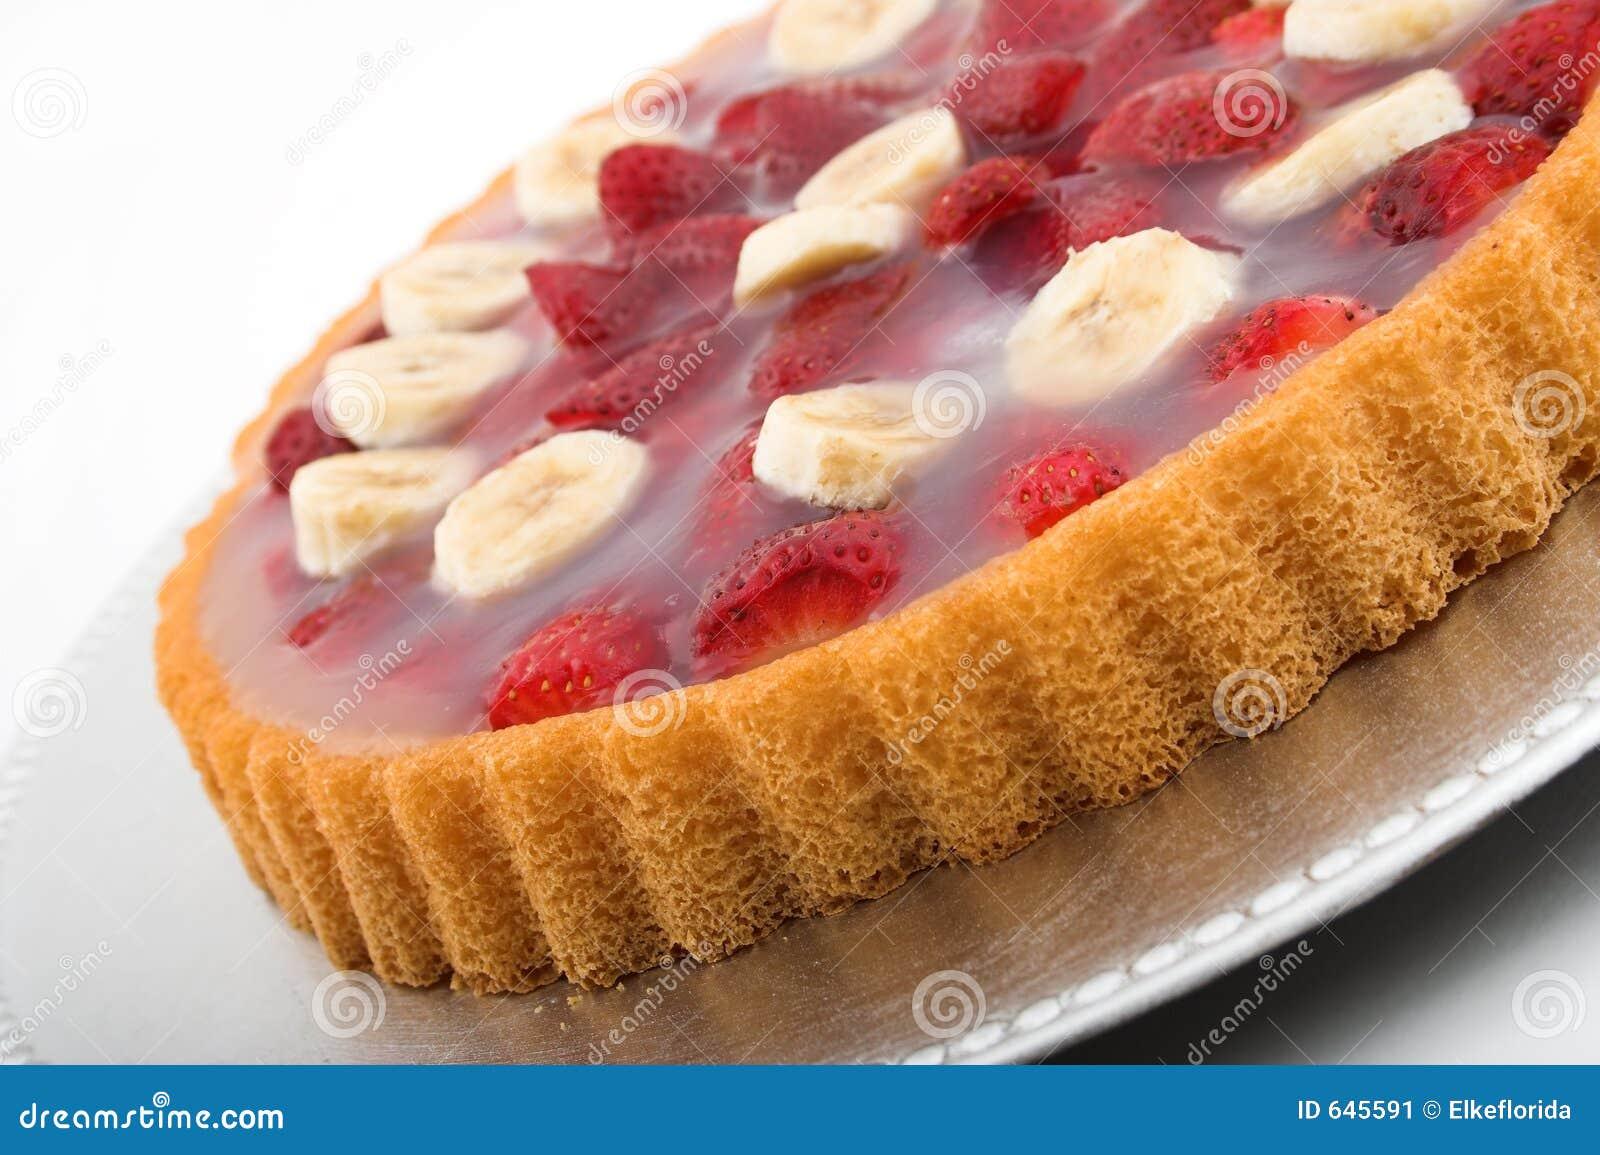 Strawberry Banana Torte Stock Image - Image: 645591